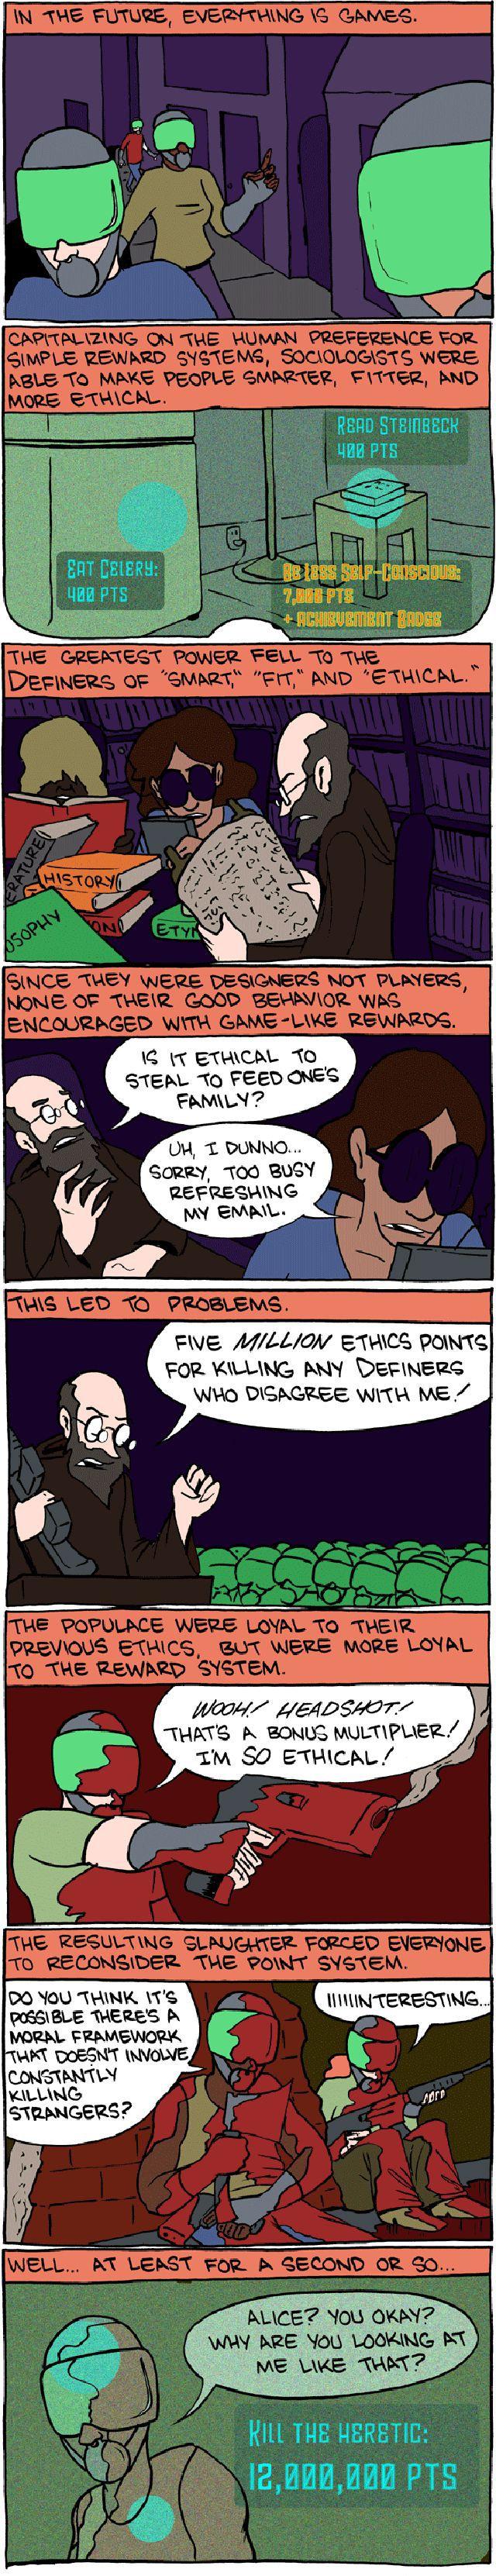 Subversive Futuristic Comic Strip